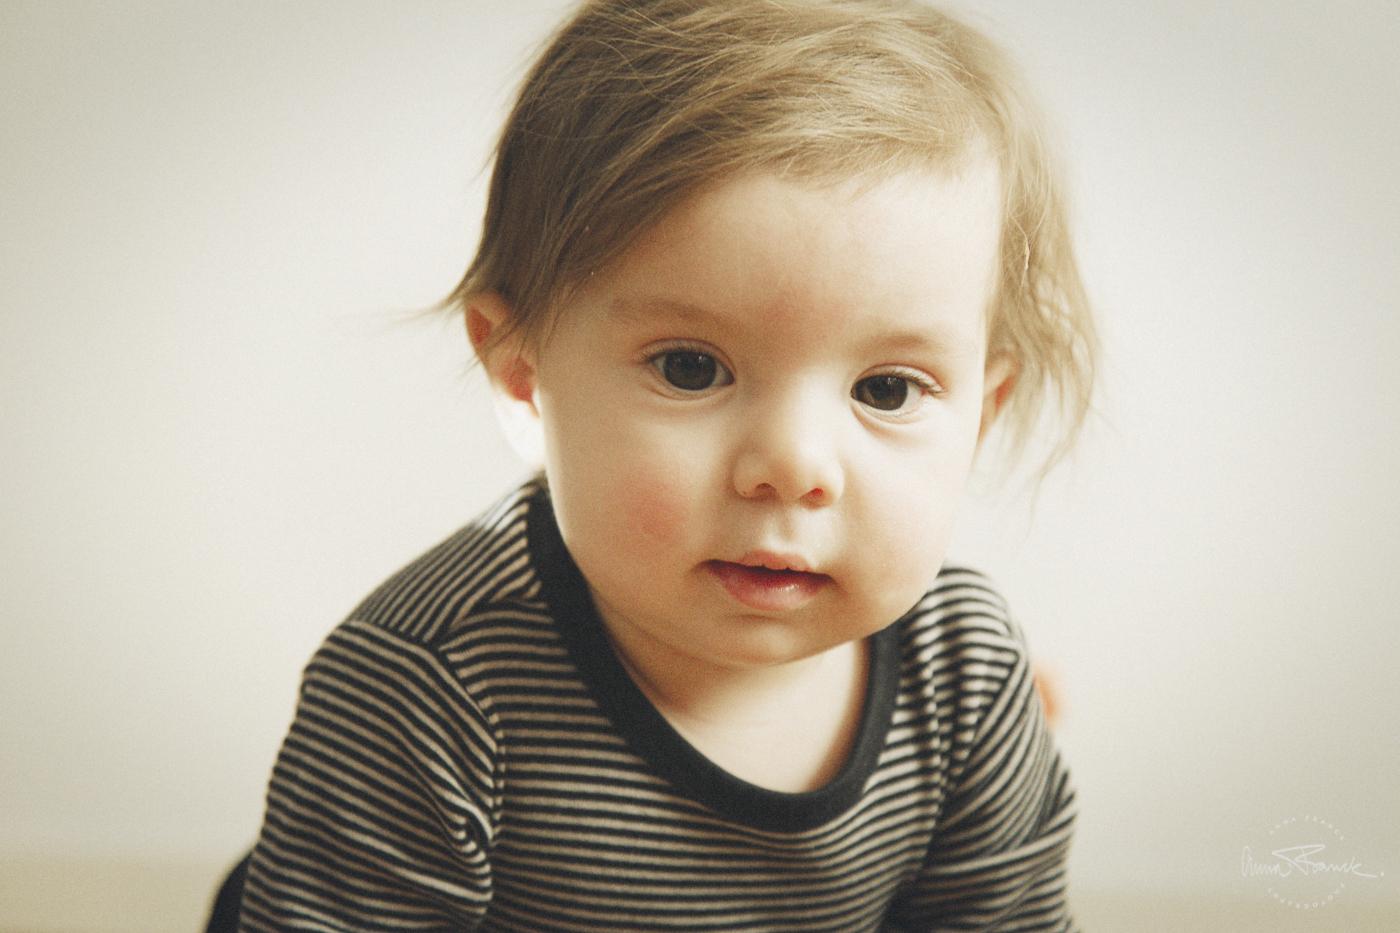 anna, franck, photography, fotograf, stockholm, barnfotografering, kids, family, portraits, onlocation, natural, relaxed, hemma, hos, baby, porträttfotografering, lapsikuvaus, parainen, turku, valokuvaaja